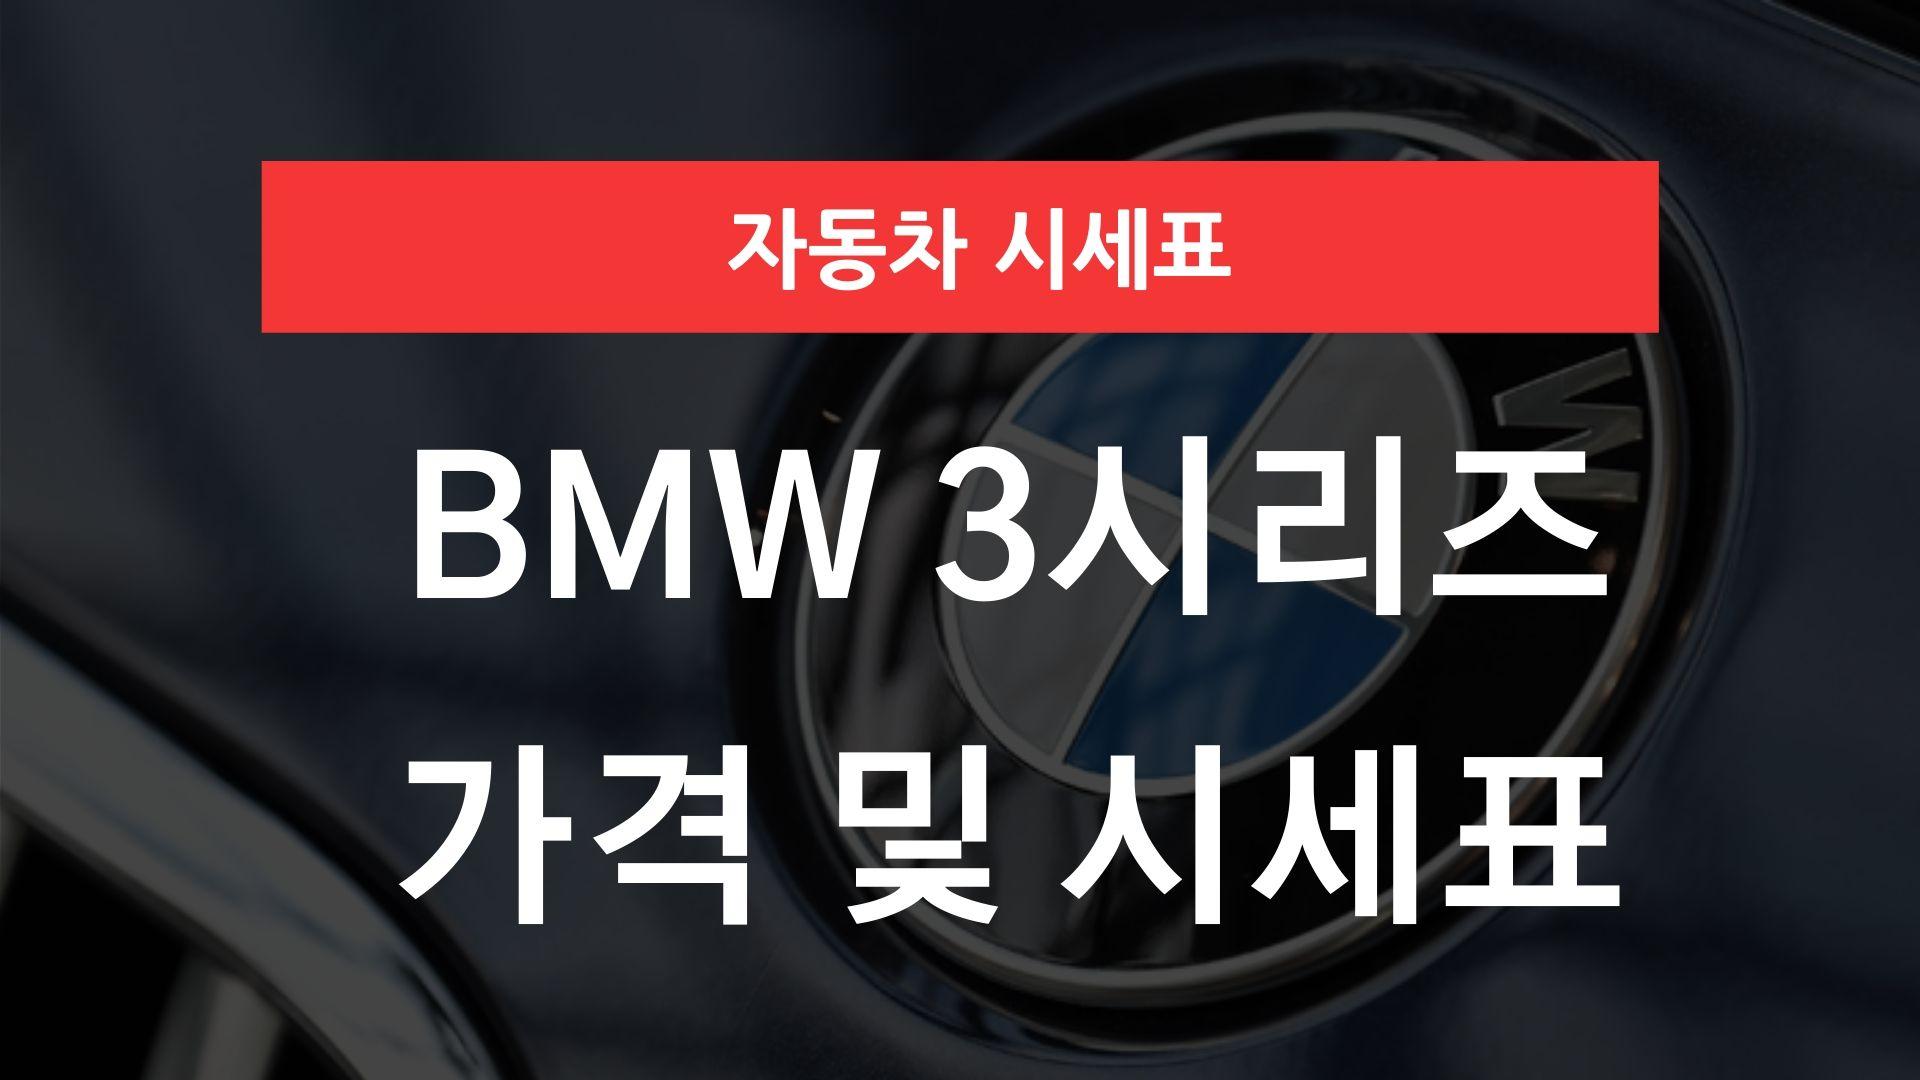 BMW 3시리즈 가격